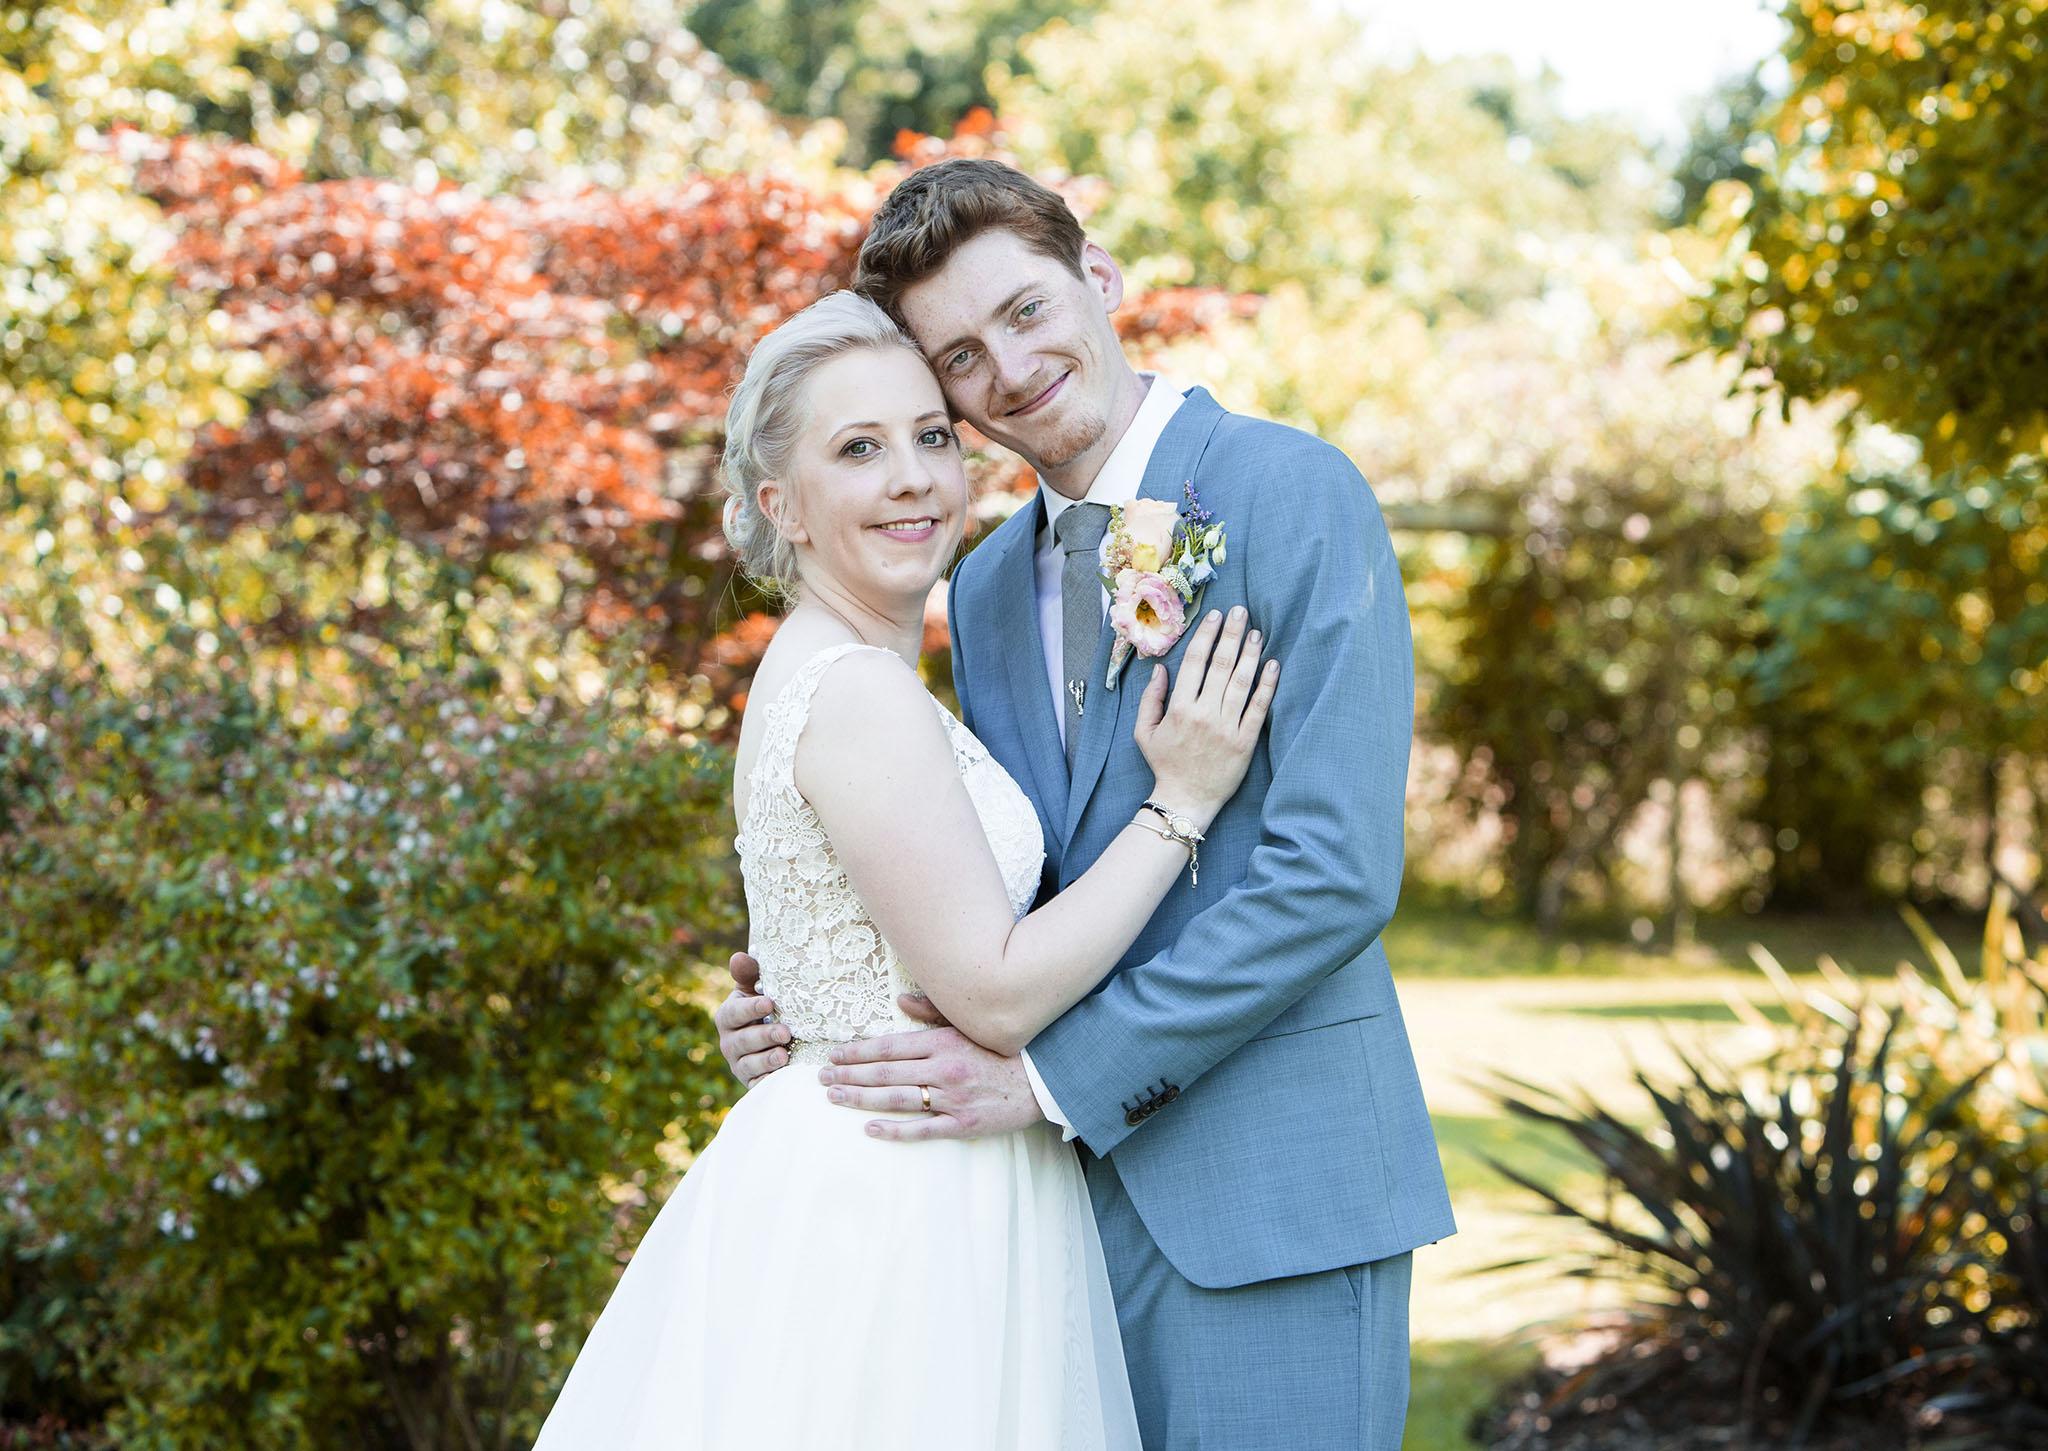 elizabethgphotography_kingslangley_hertfordshire_fineart_wedding_pottersbar_matt_katie_pegg_31.jpg